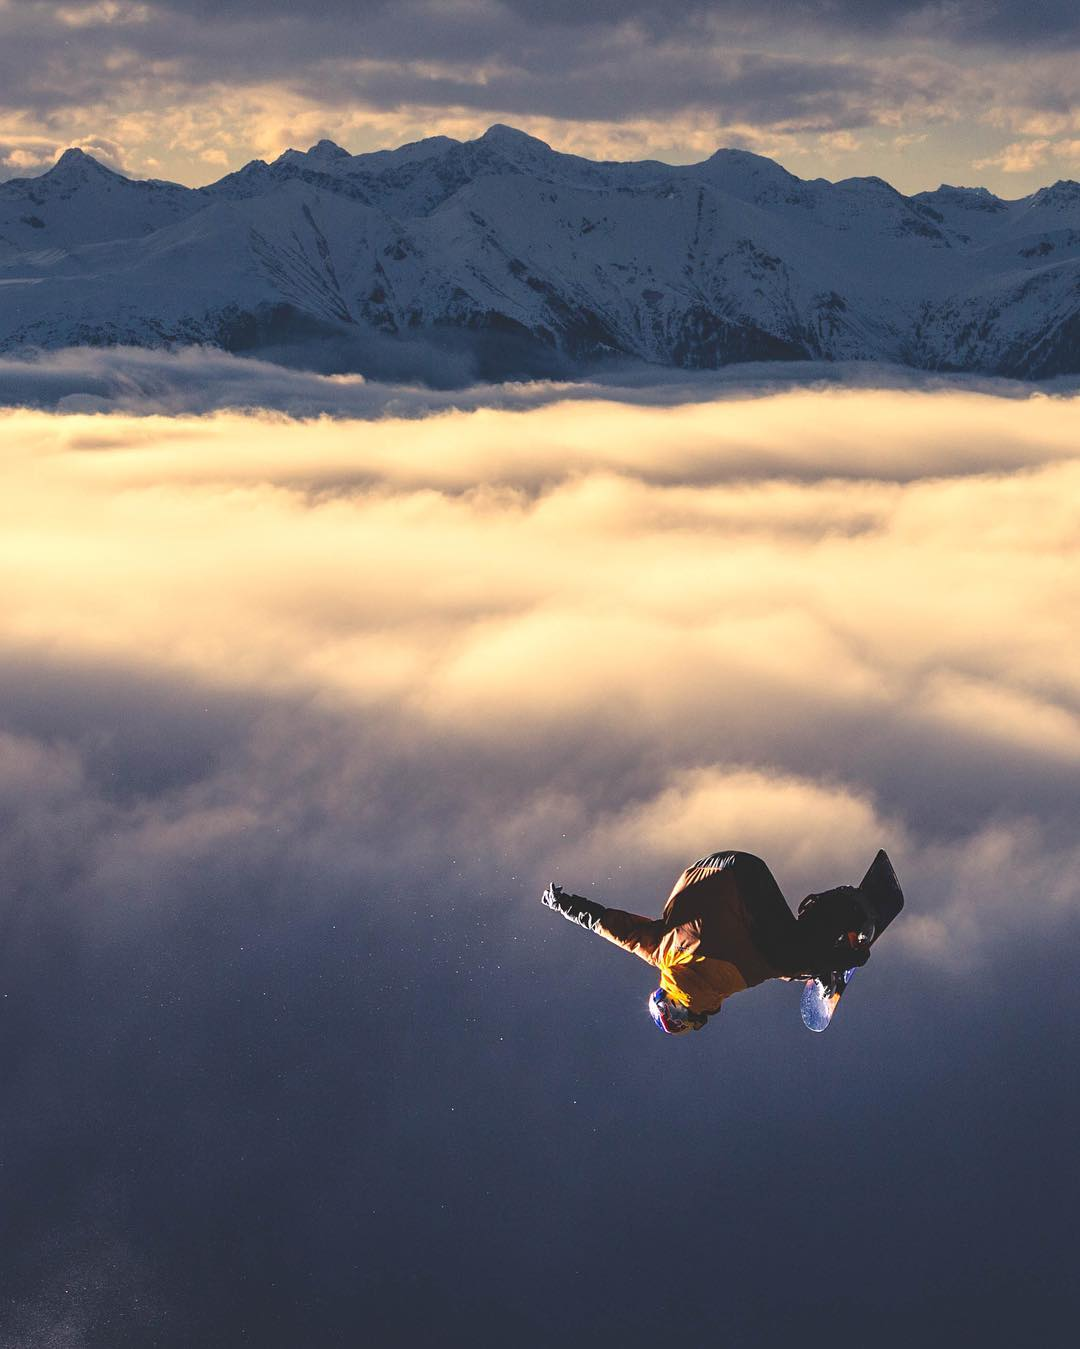 Snowboarding? More like cloudboarding.